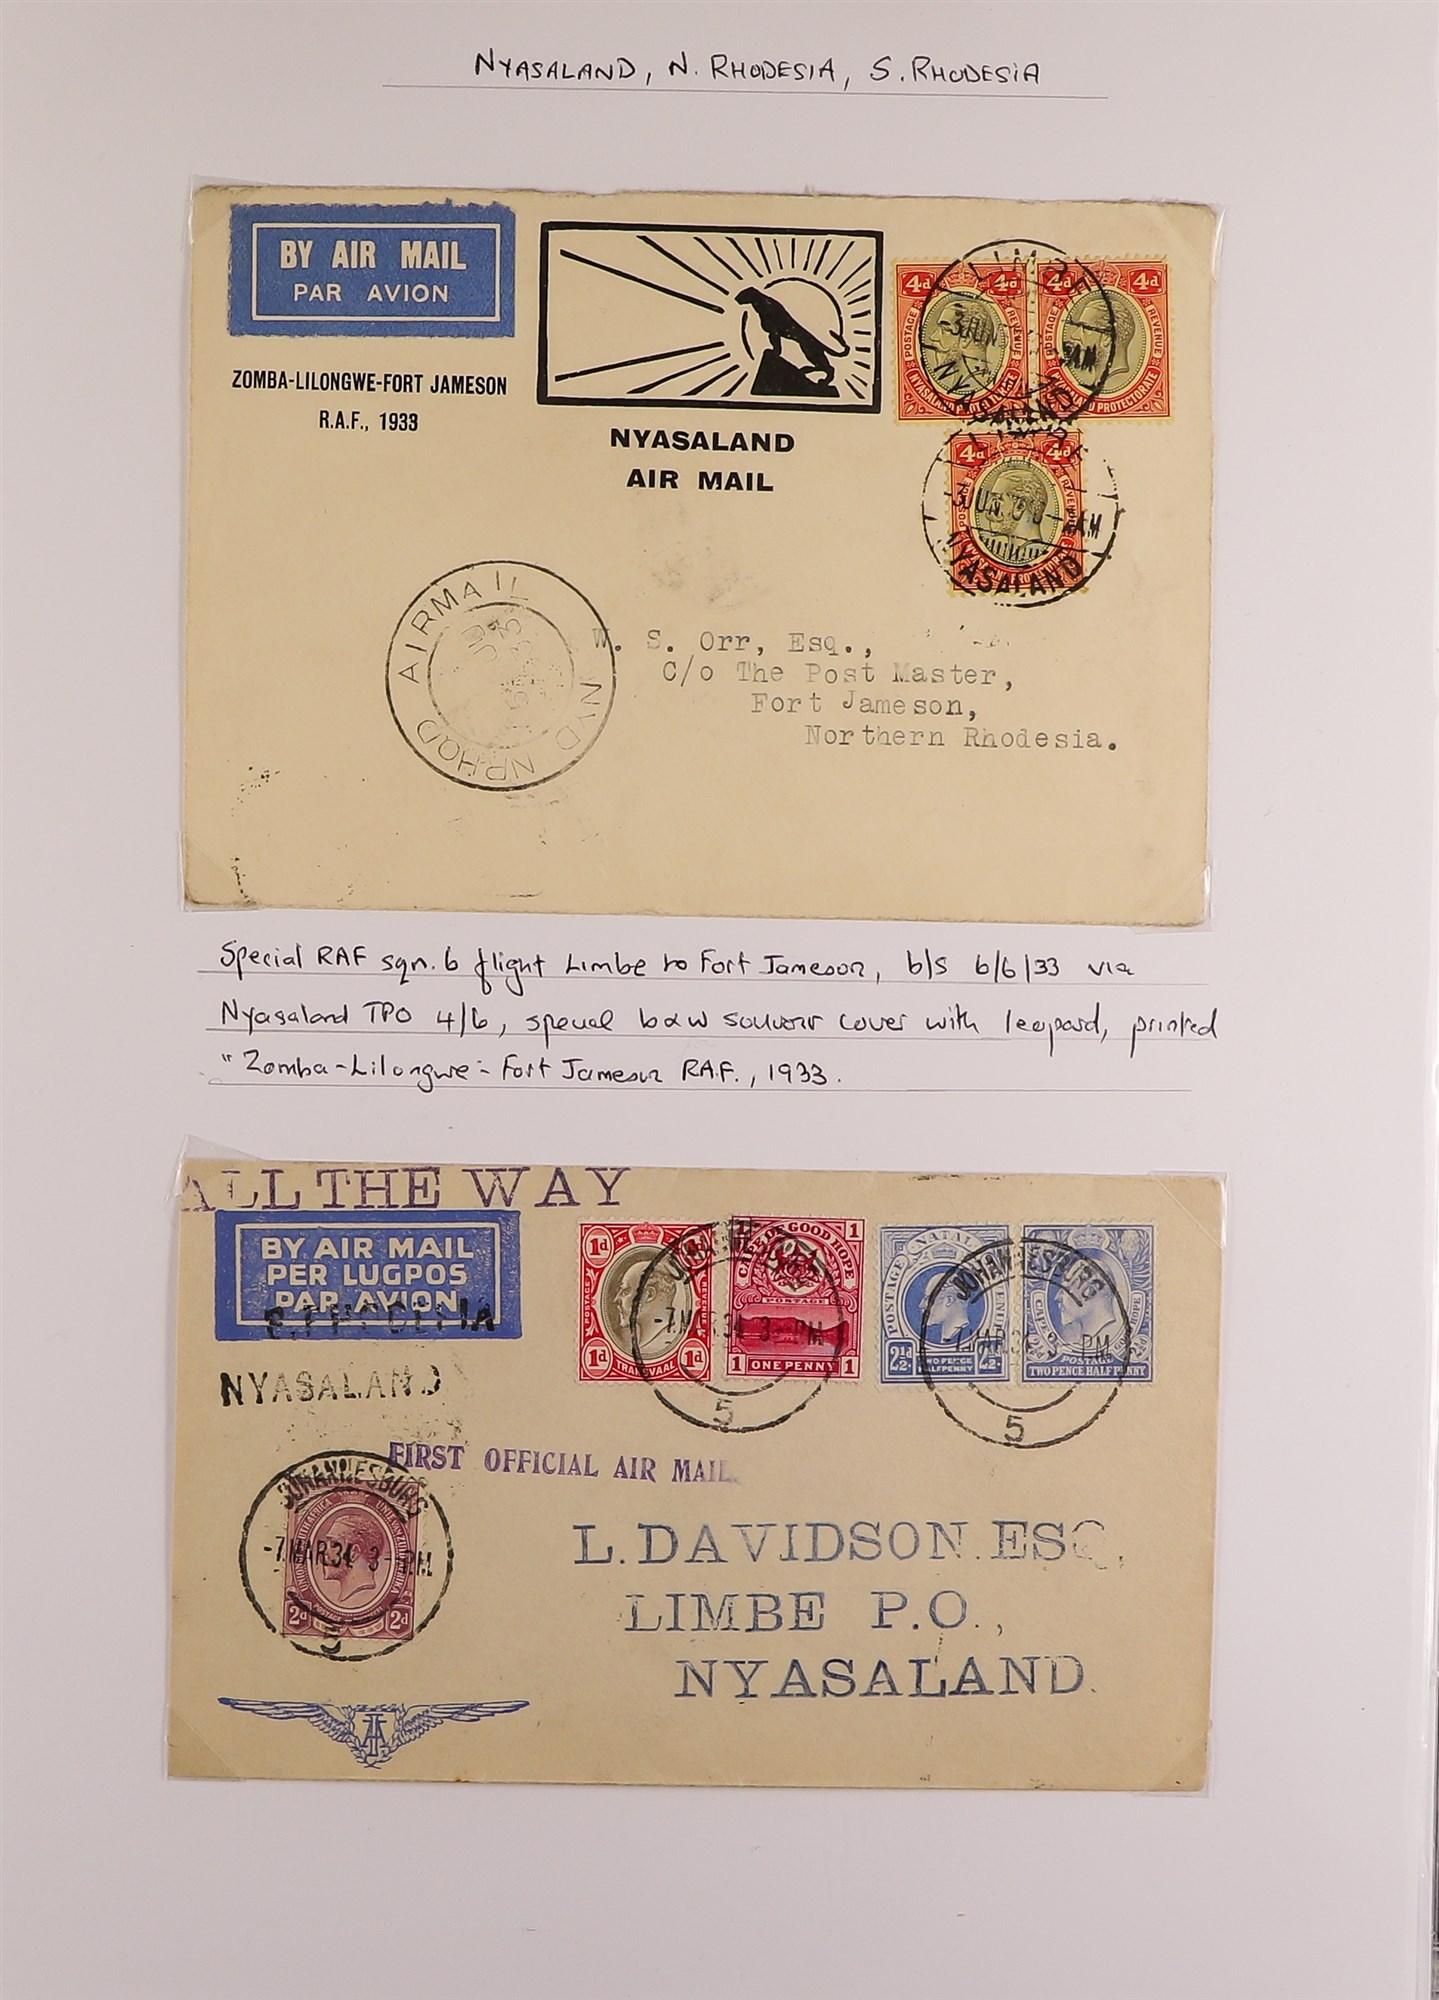 RHODESIA AIRMAIL COVERS COLLECTION 1930's-60's with Rhodesian & Nyasaland Airways (15), Nyasaland- - Image 3 of 10